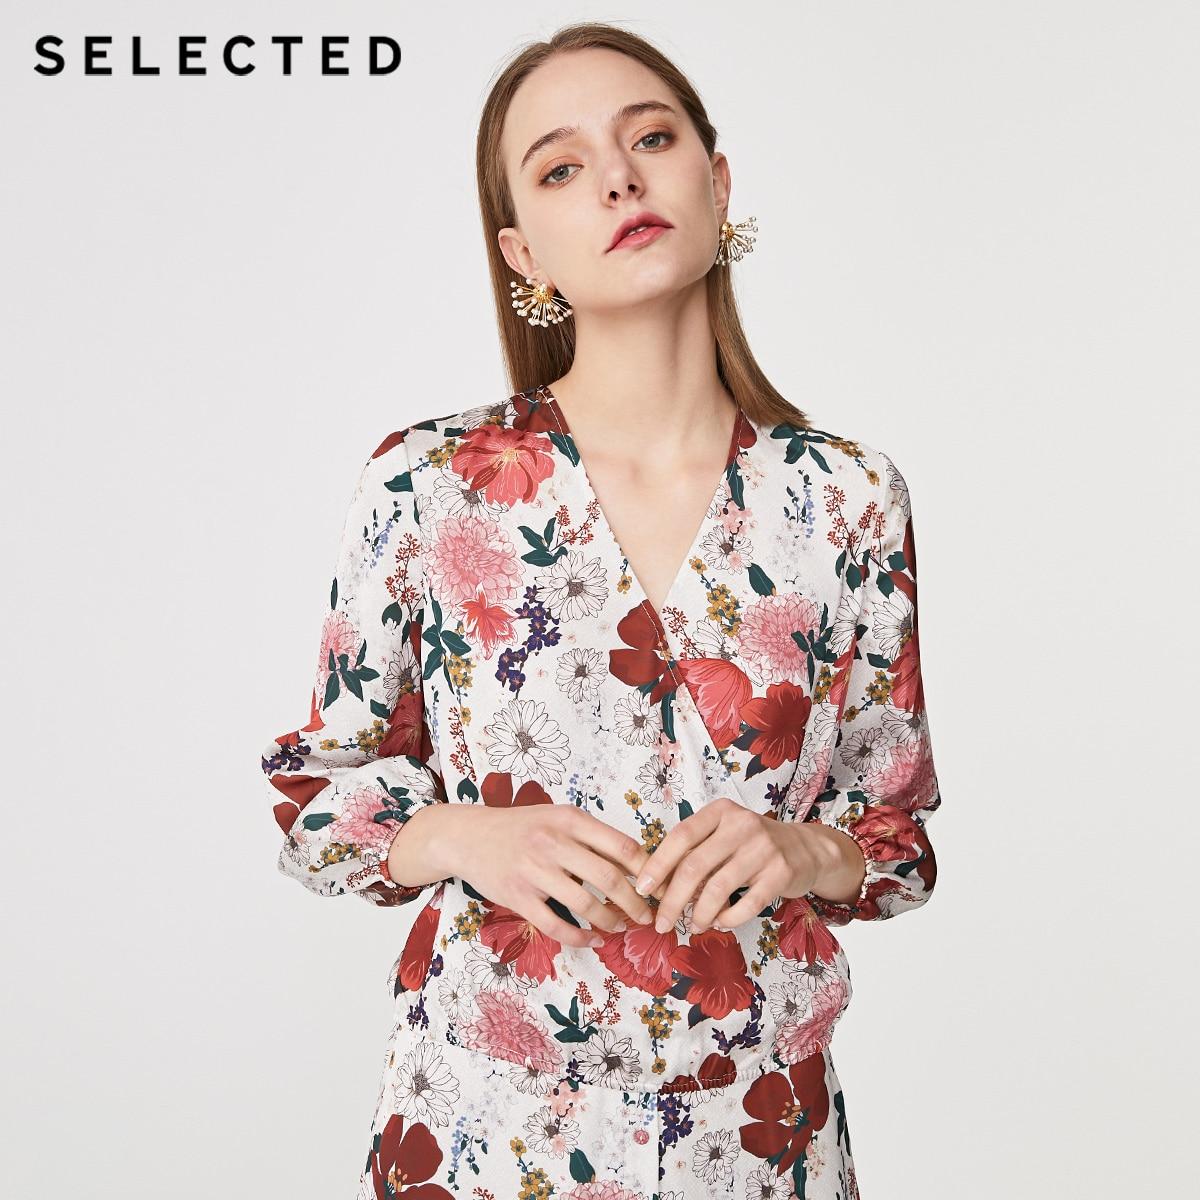 SELECTED Women's Summer Chiffon Print Loose Fit Long-sleeved Shirt S 419251508